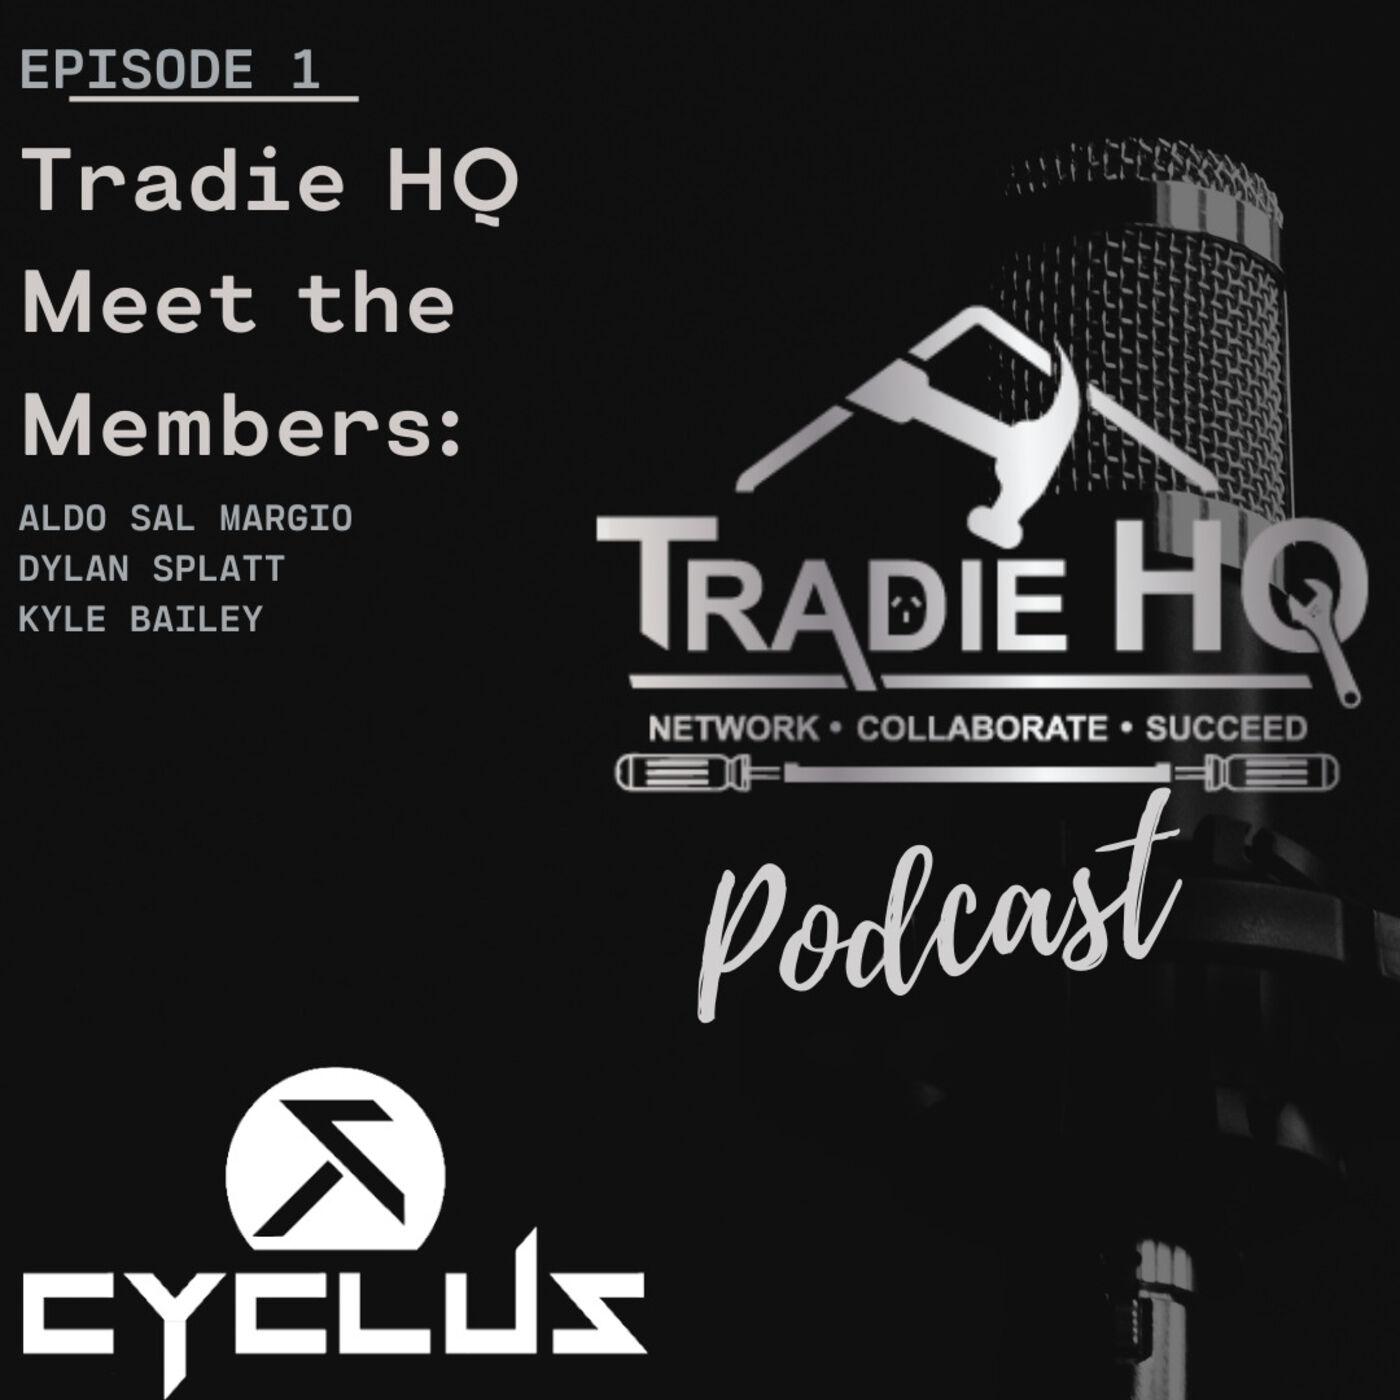 Episode 1 - Tradie HQ MTM - Cyclus